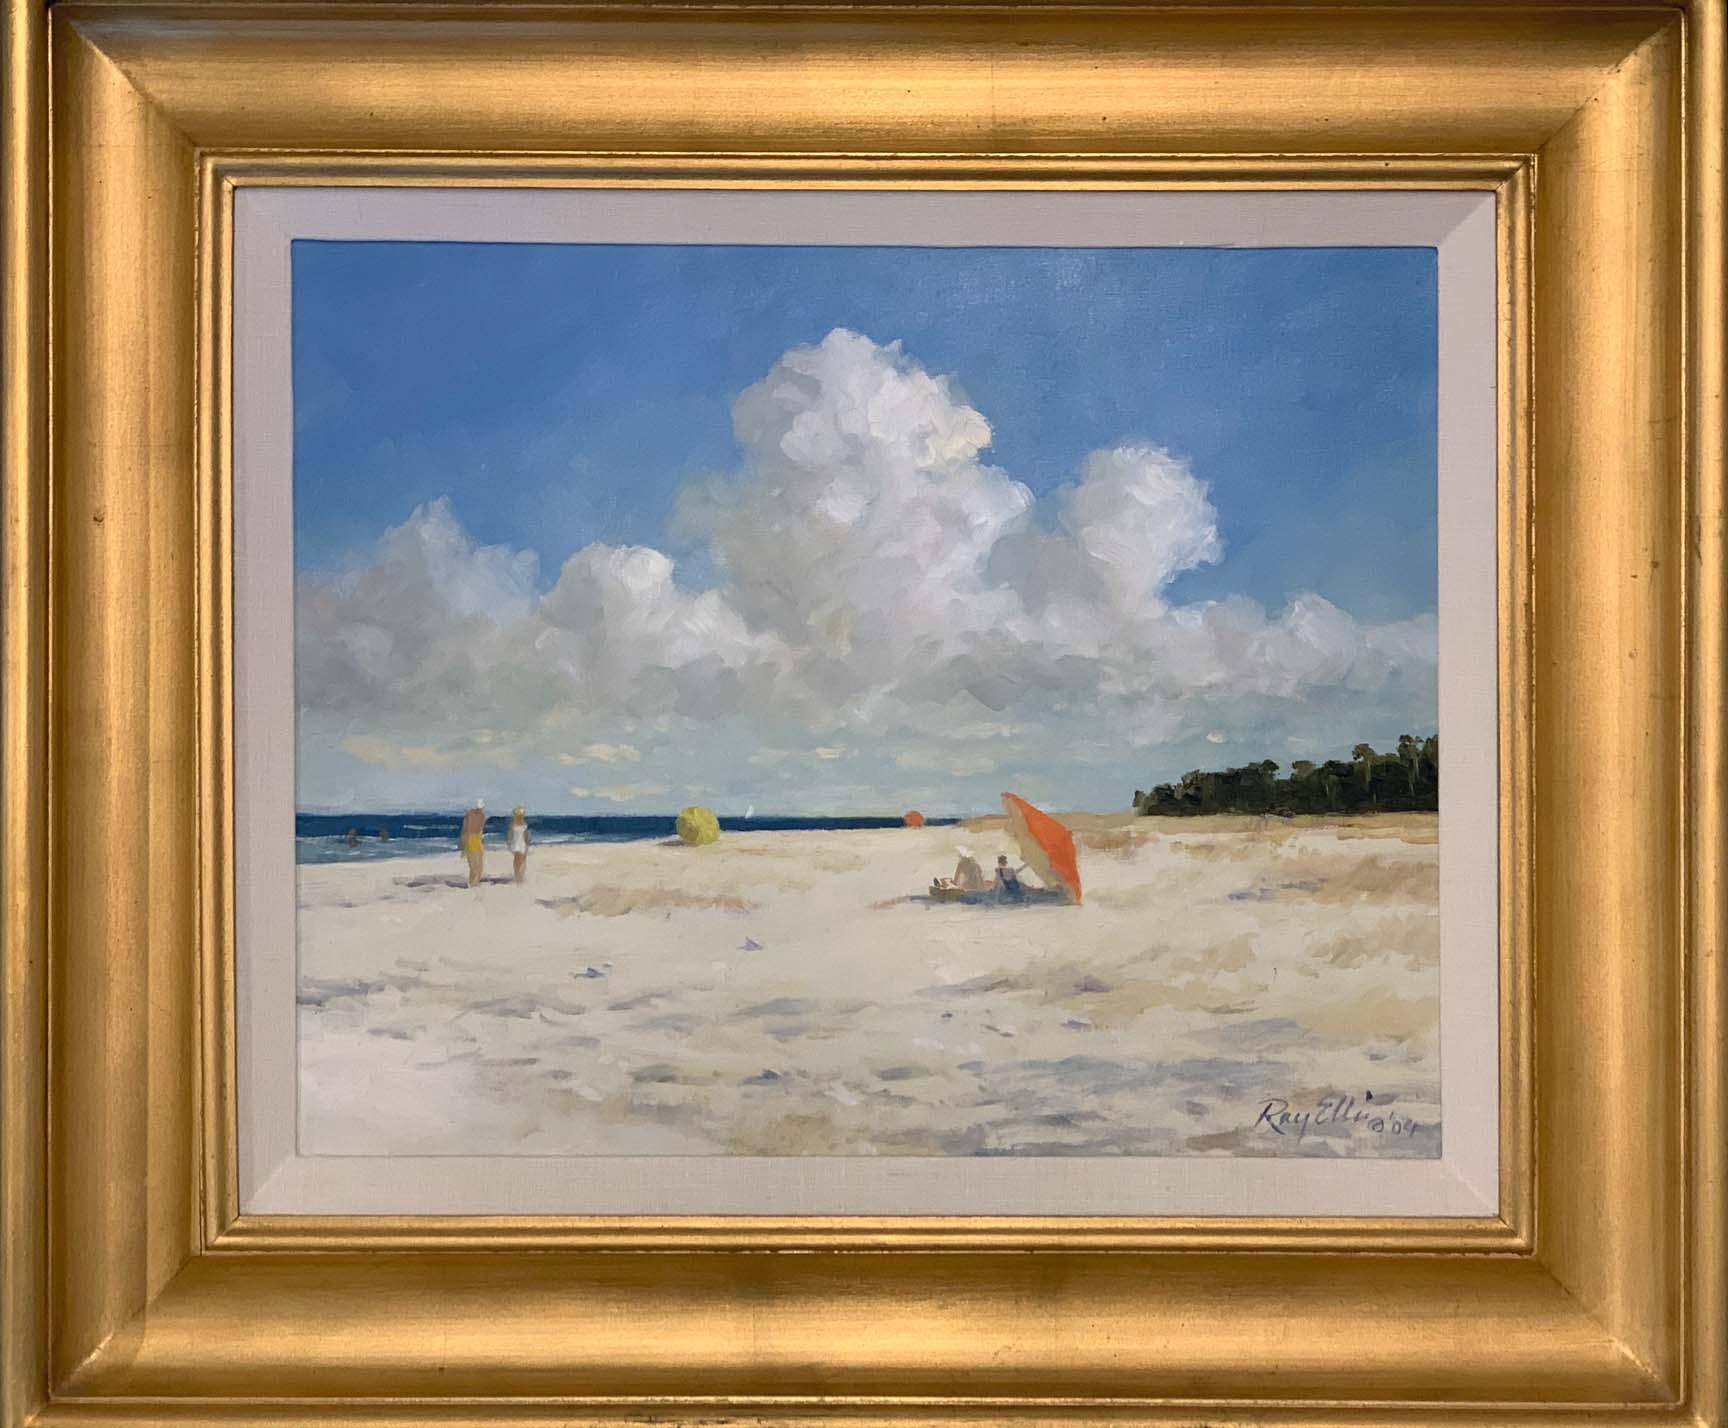 Morning at the Beach-framed